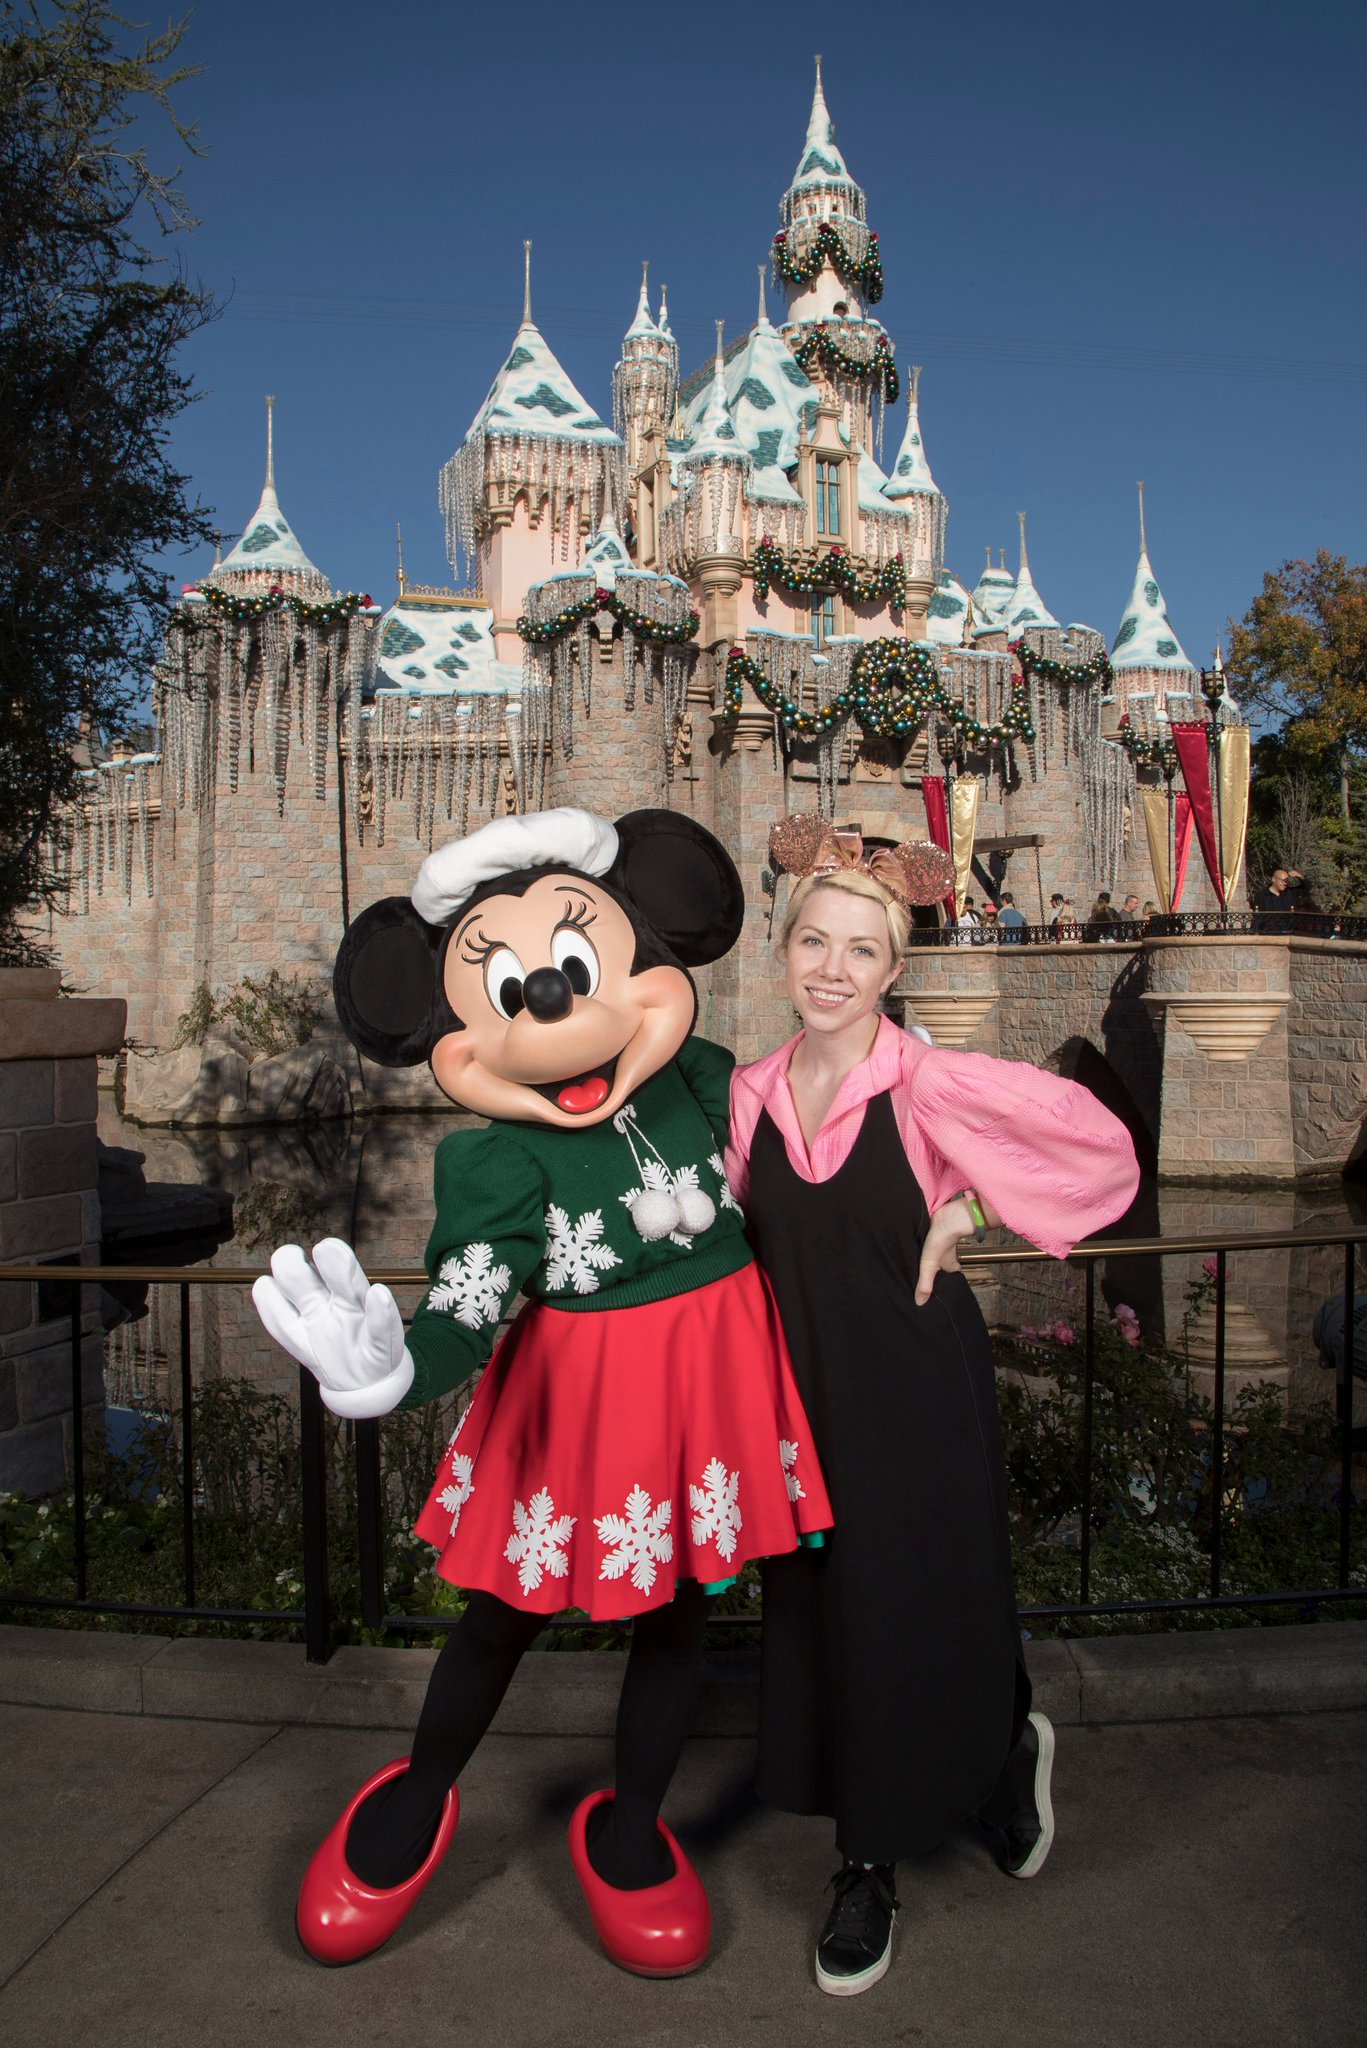 Just two gals catching up. ☺️ @Disneyland #DisneylandHolidays https://t.co/hJ6BPyWBJO